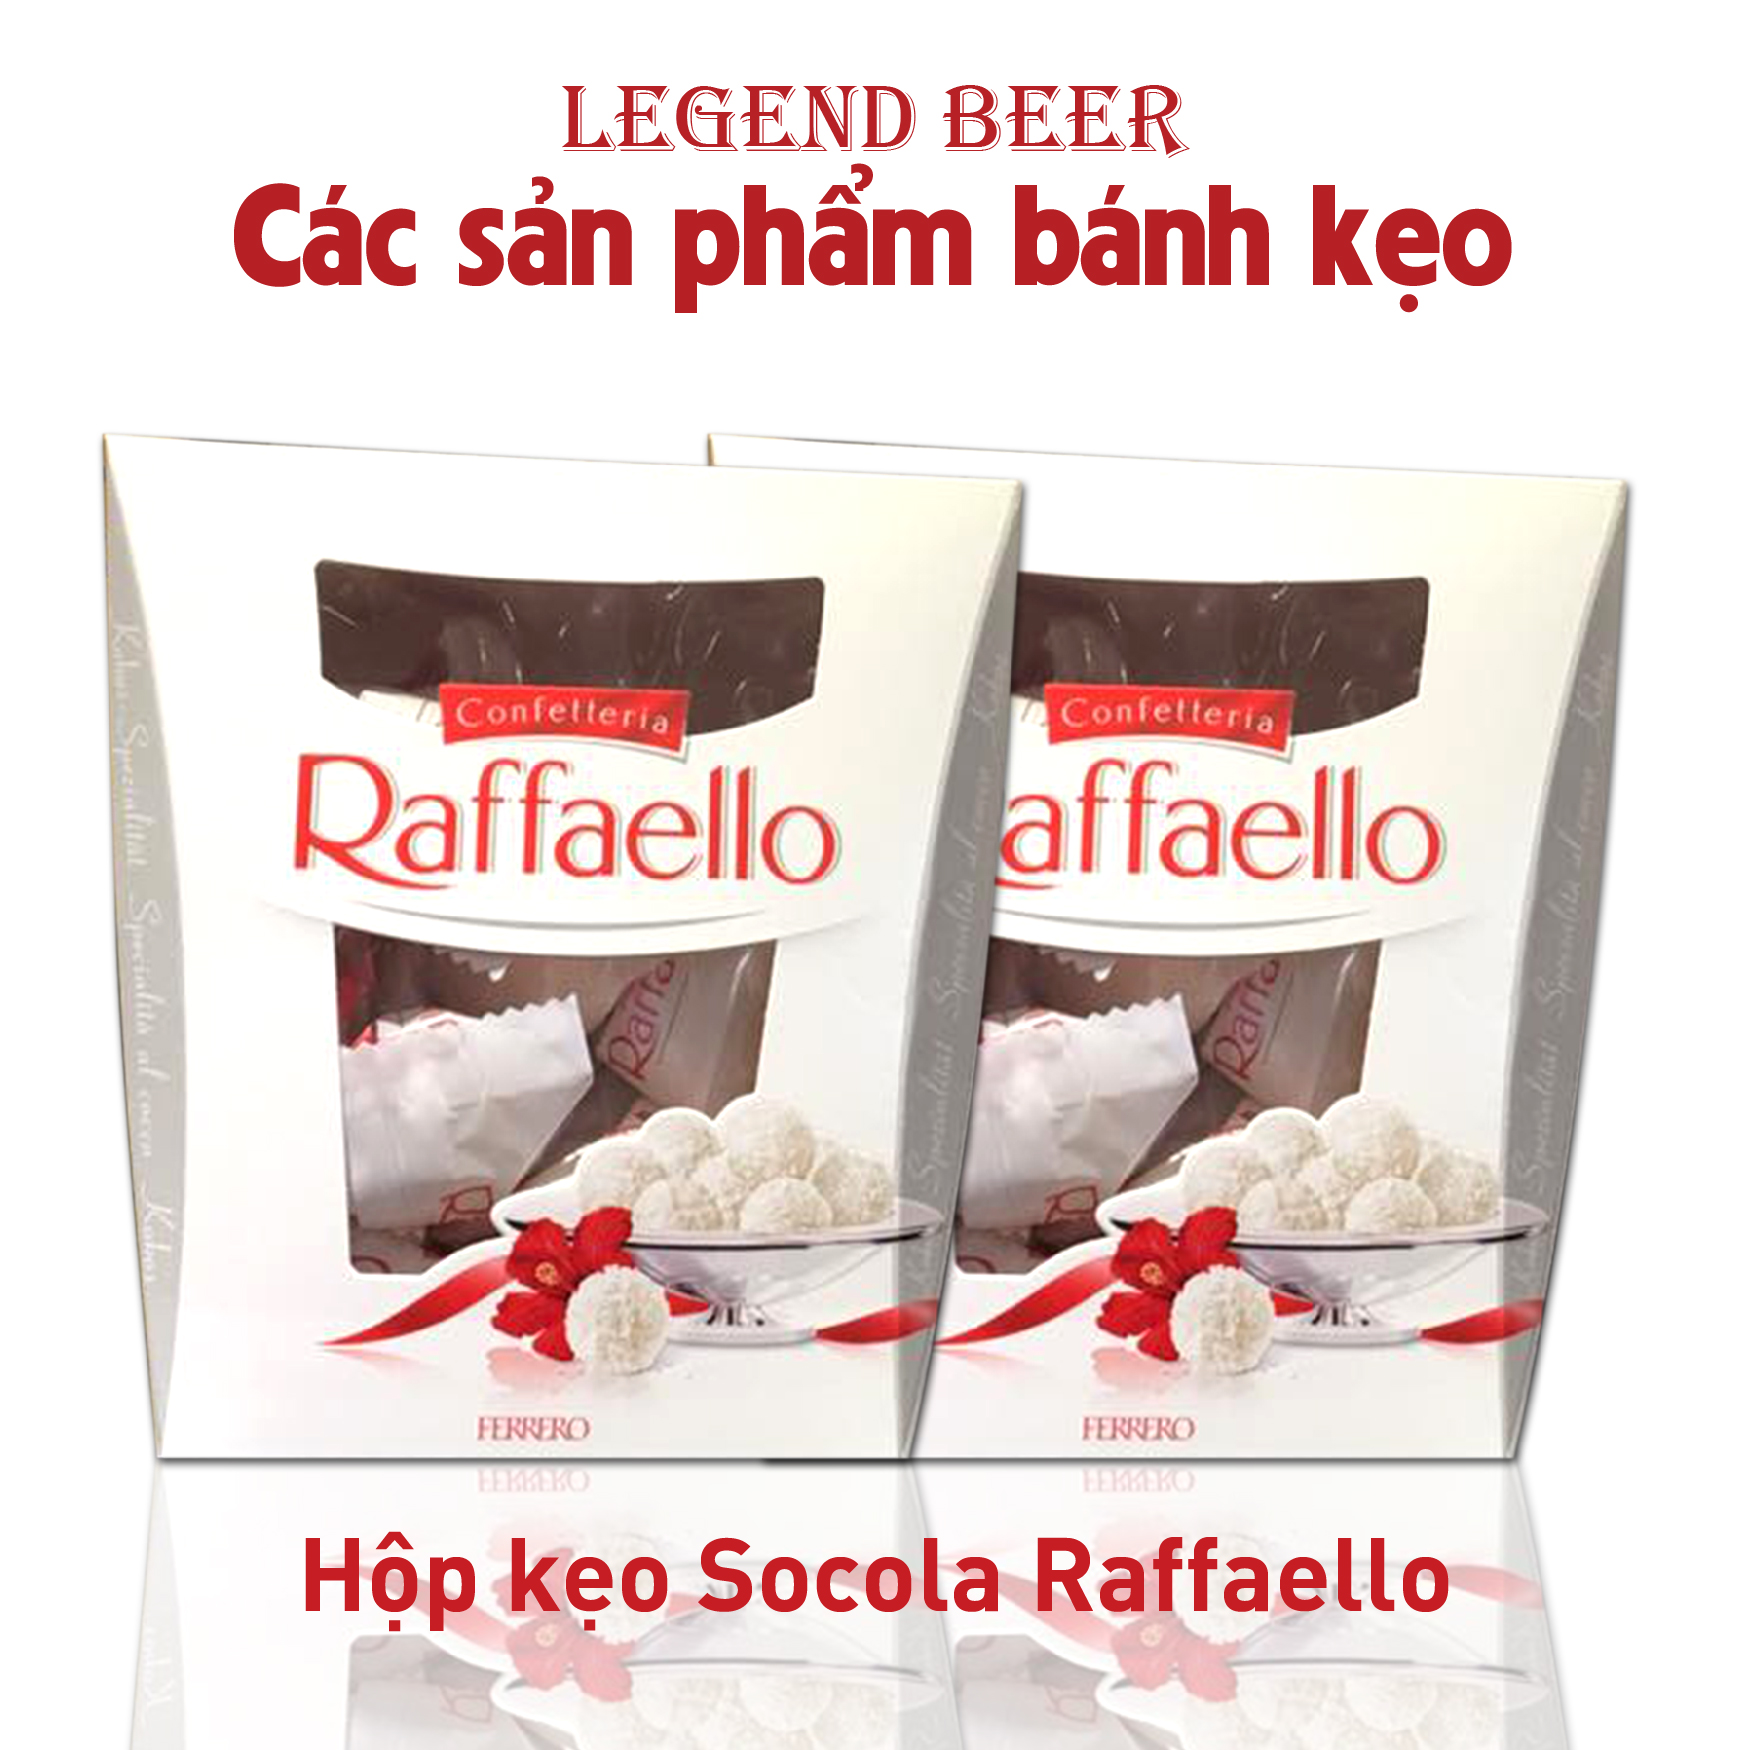 Hộp kẹo socola Raffaello